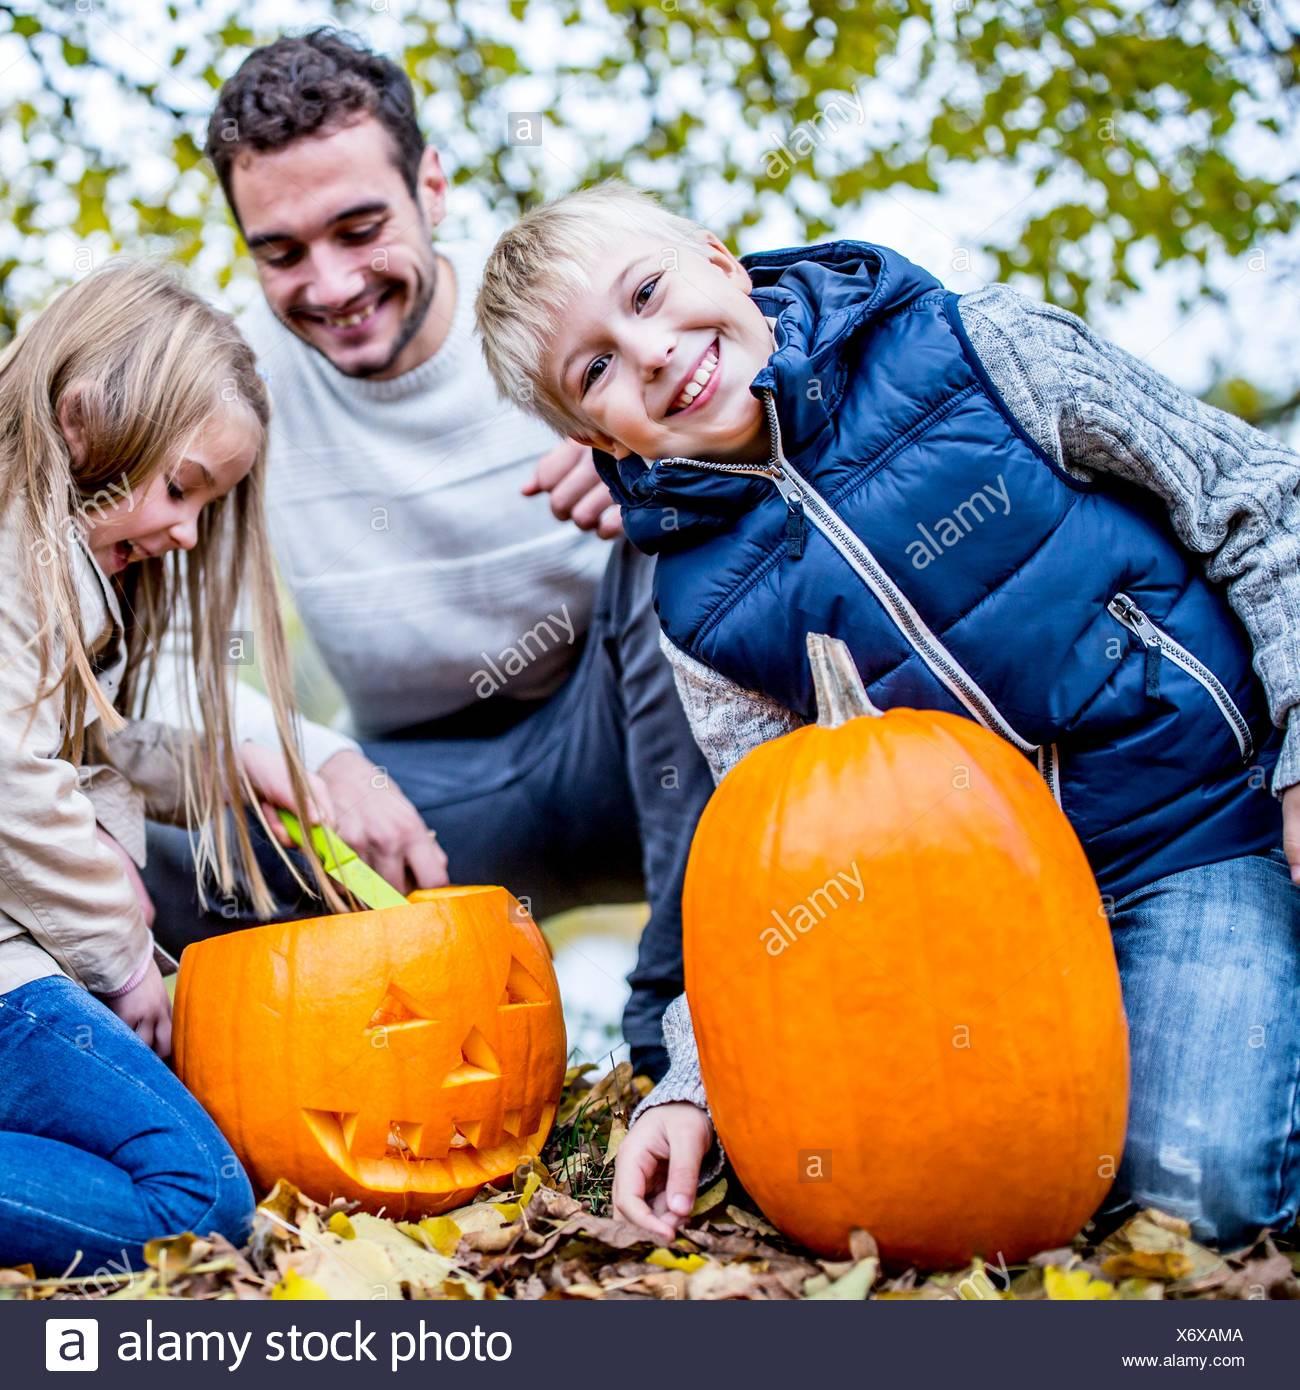 MODEL RELEASED. Family making Halloween pumpkin. - Stock Image